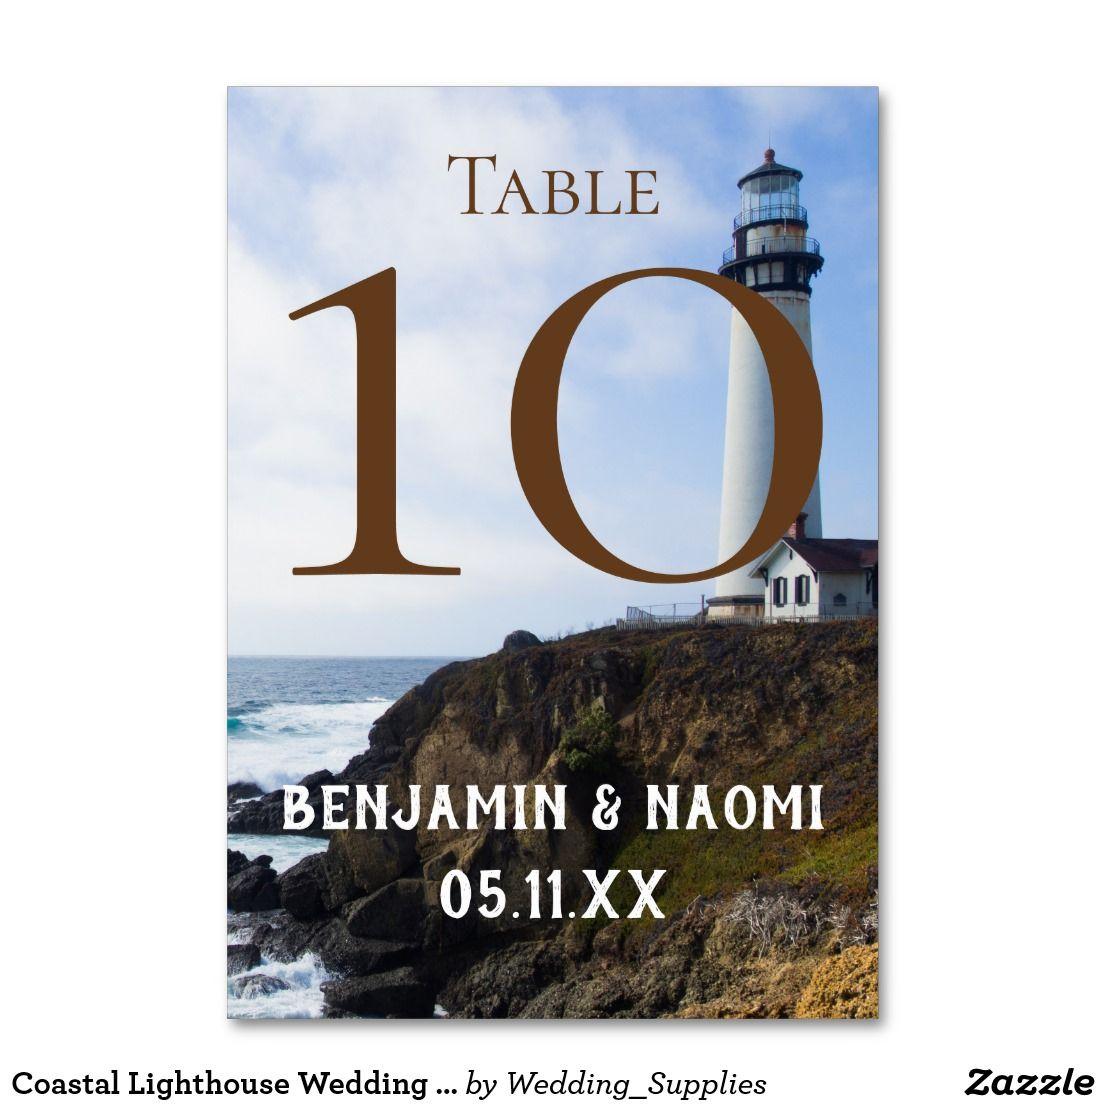 Customizable coastal lighthouse wedding table number cards